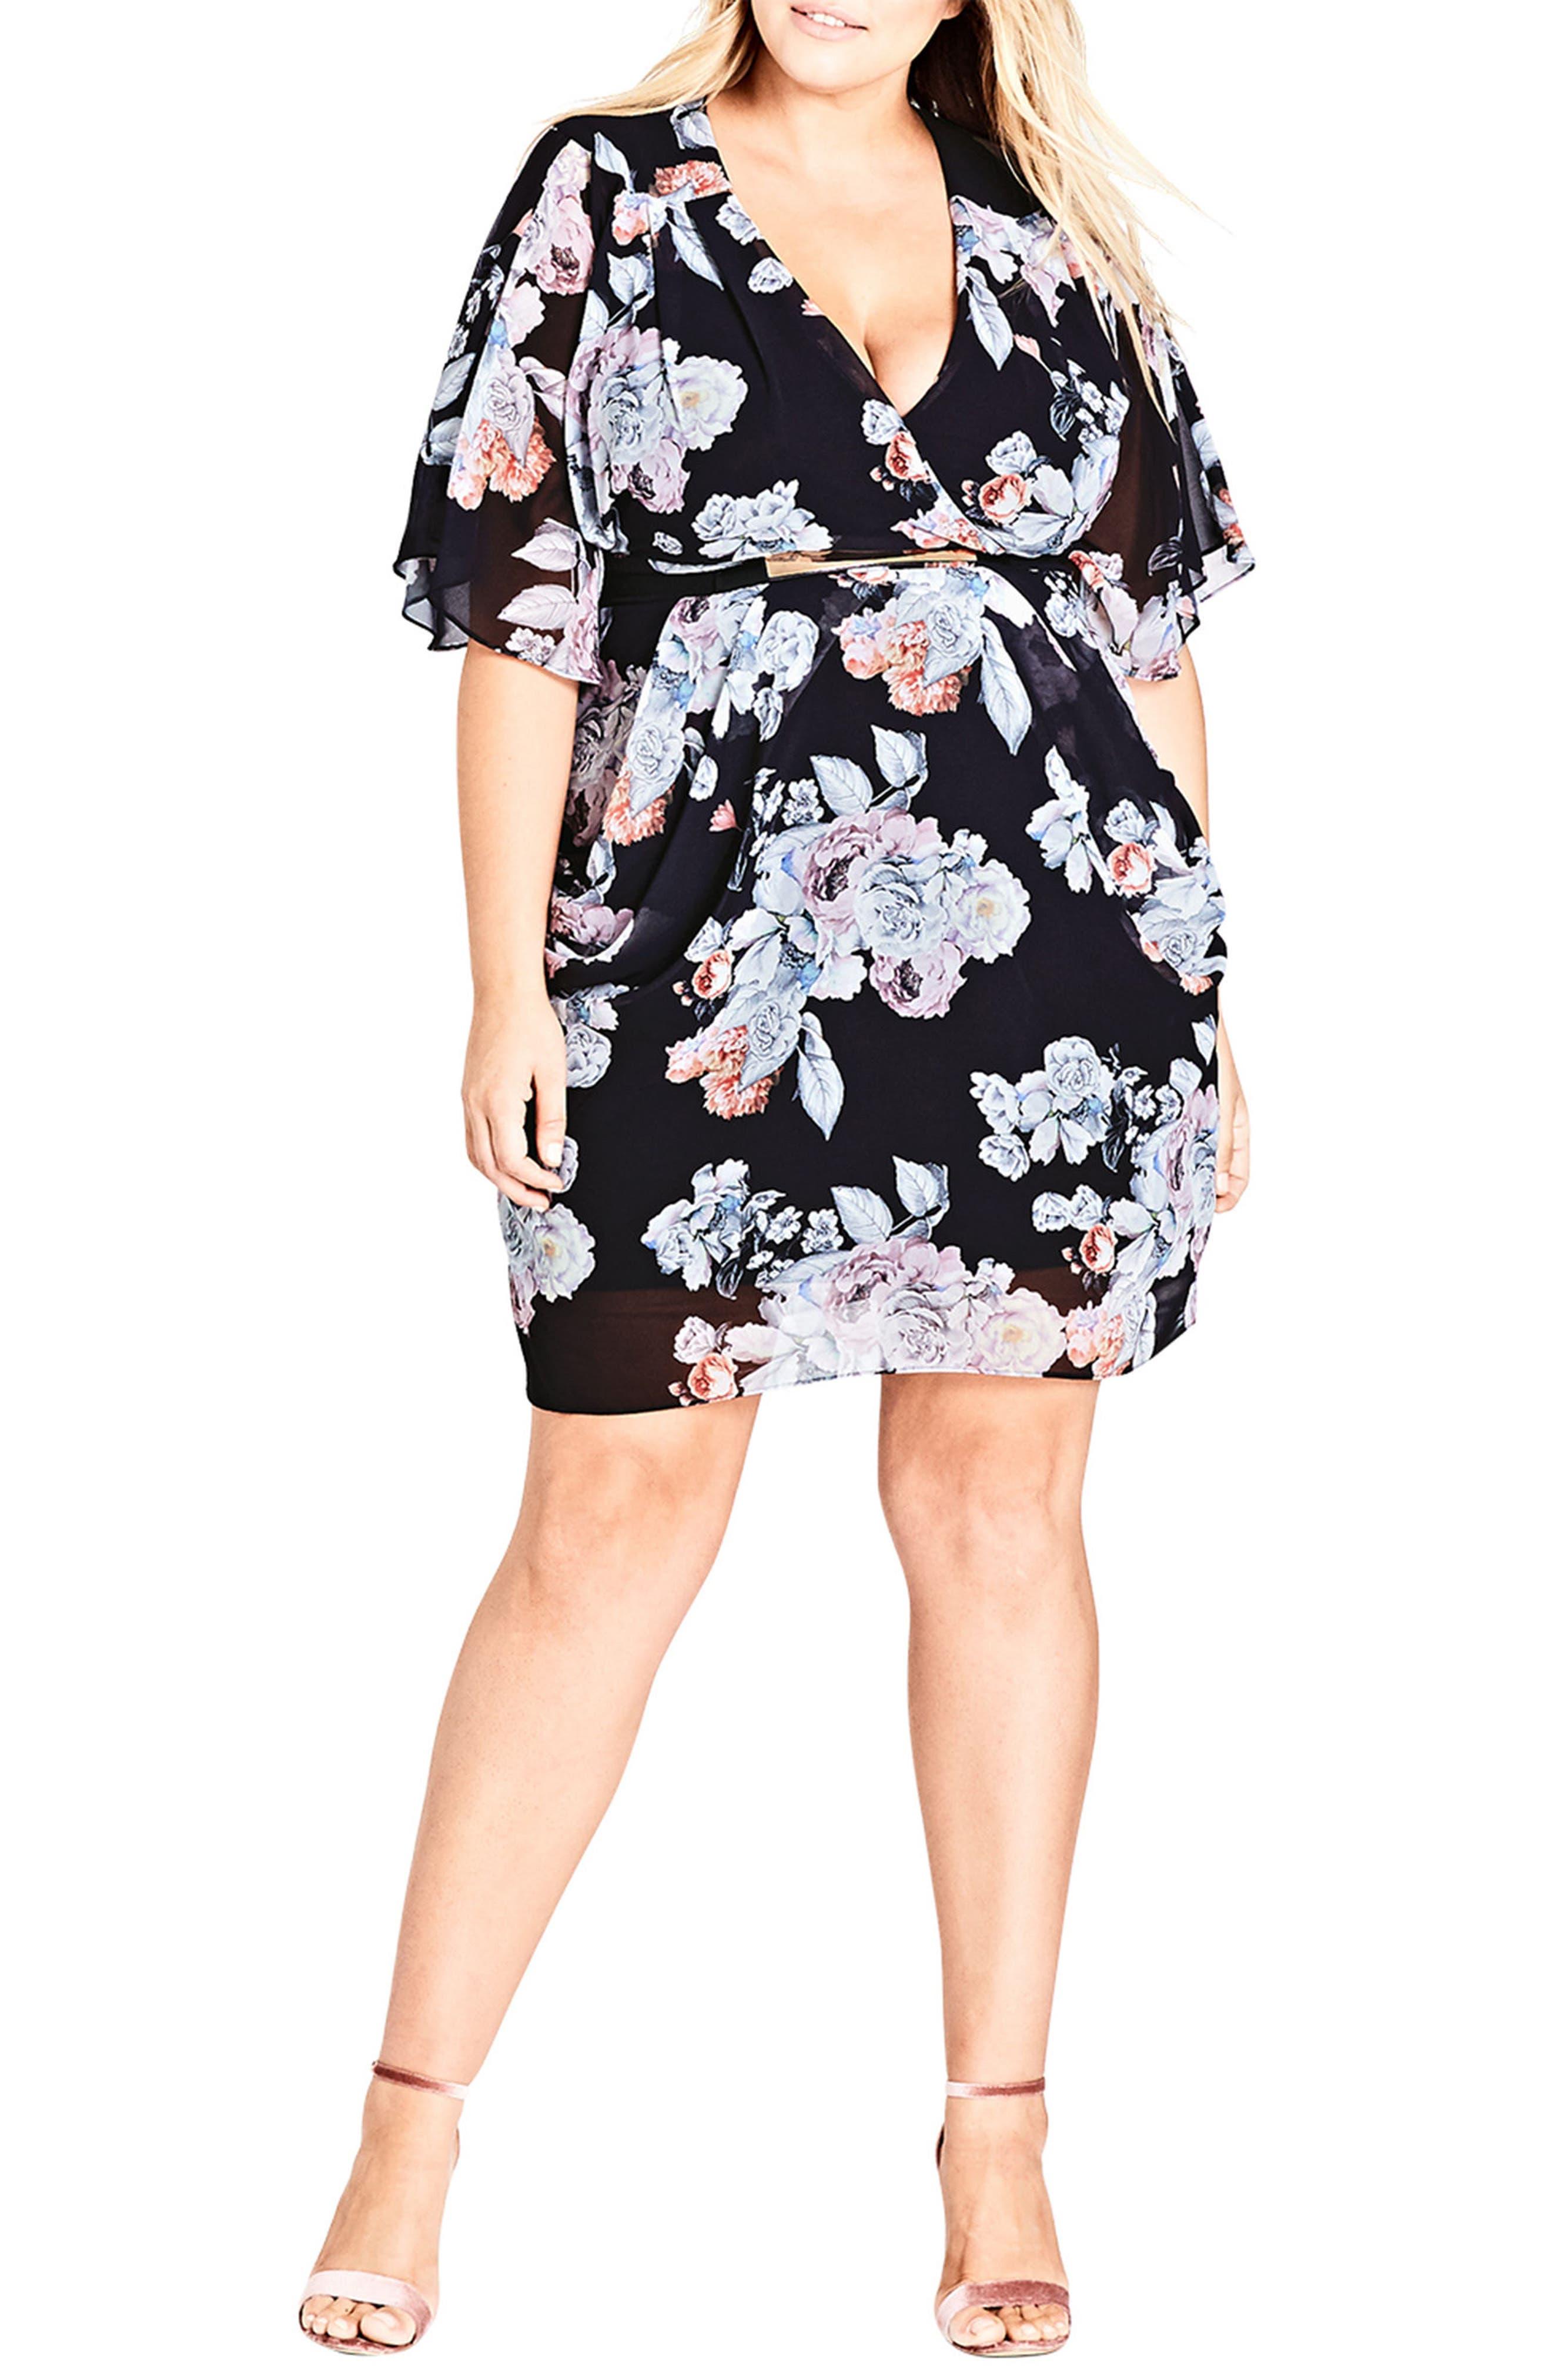 Main Image - City Chic Floral Print Belted Faux Wrap Dress (Plus Size)